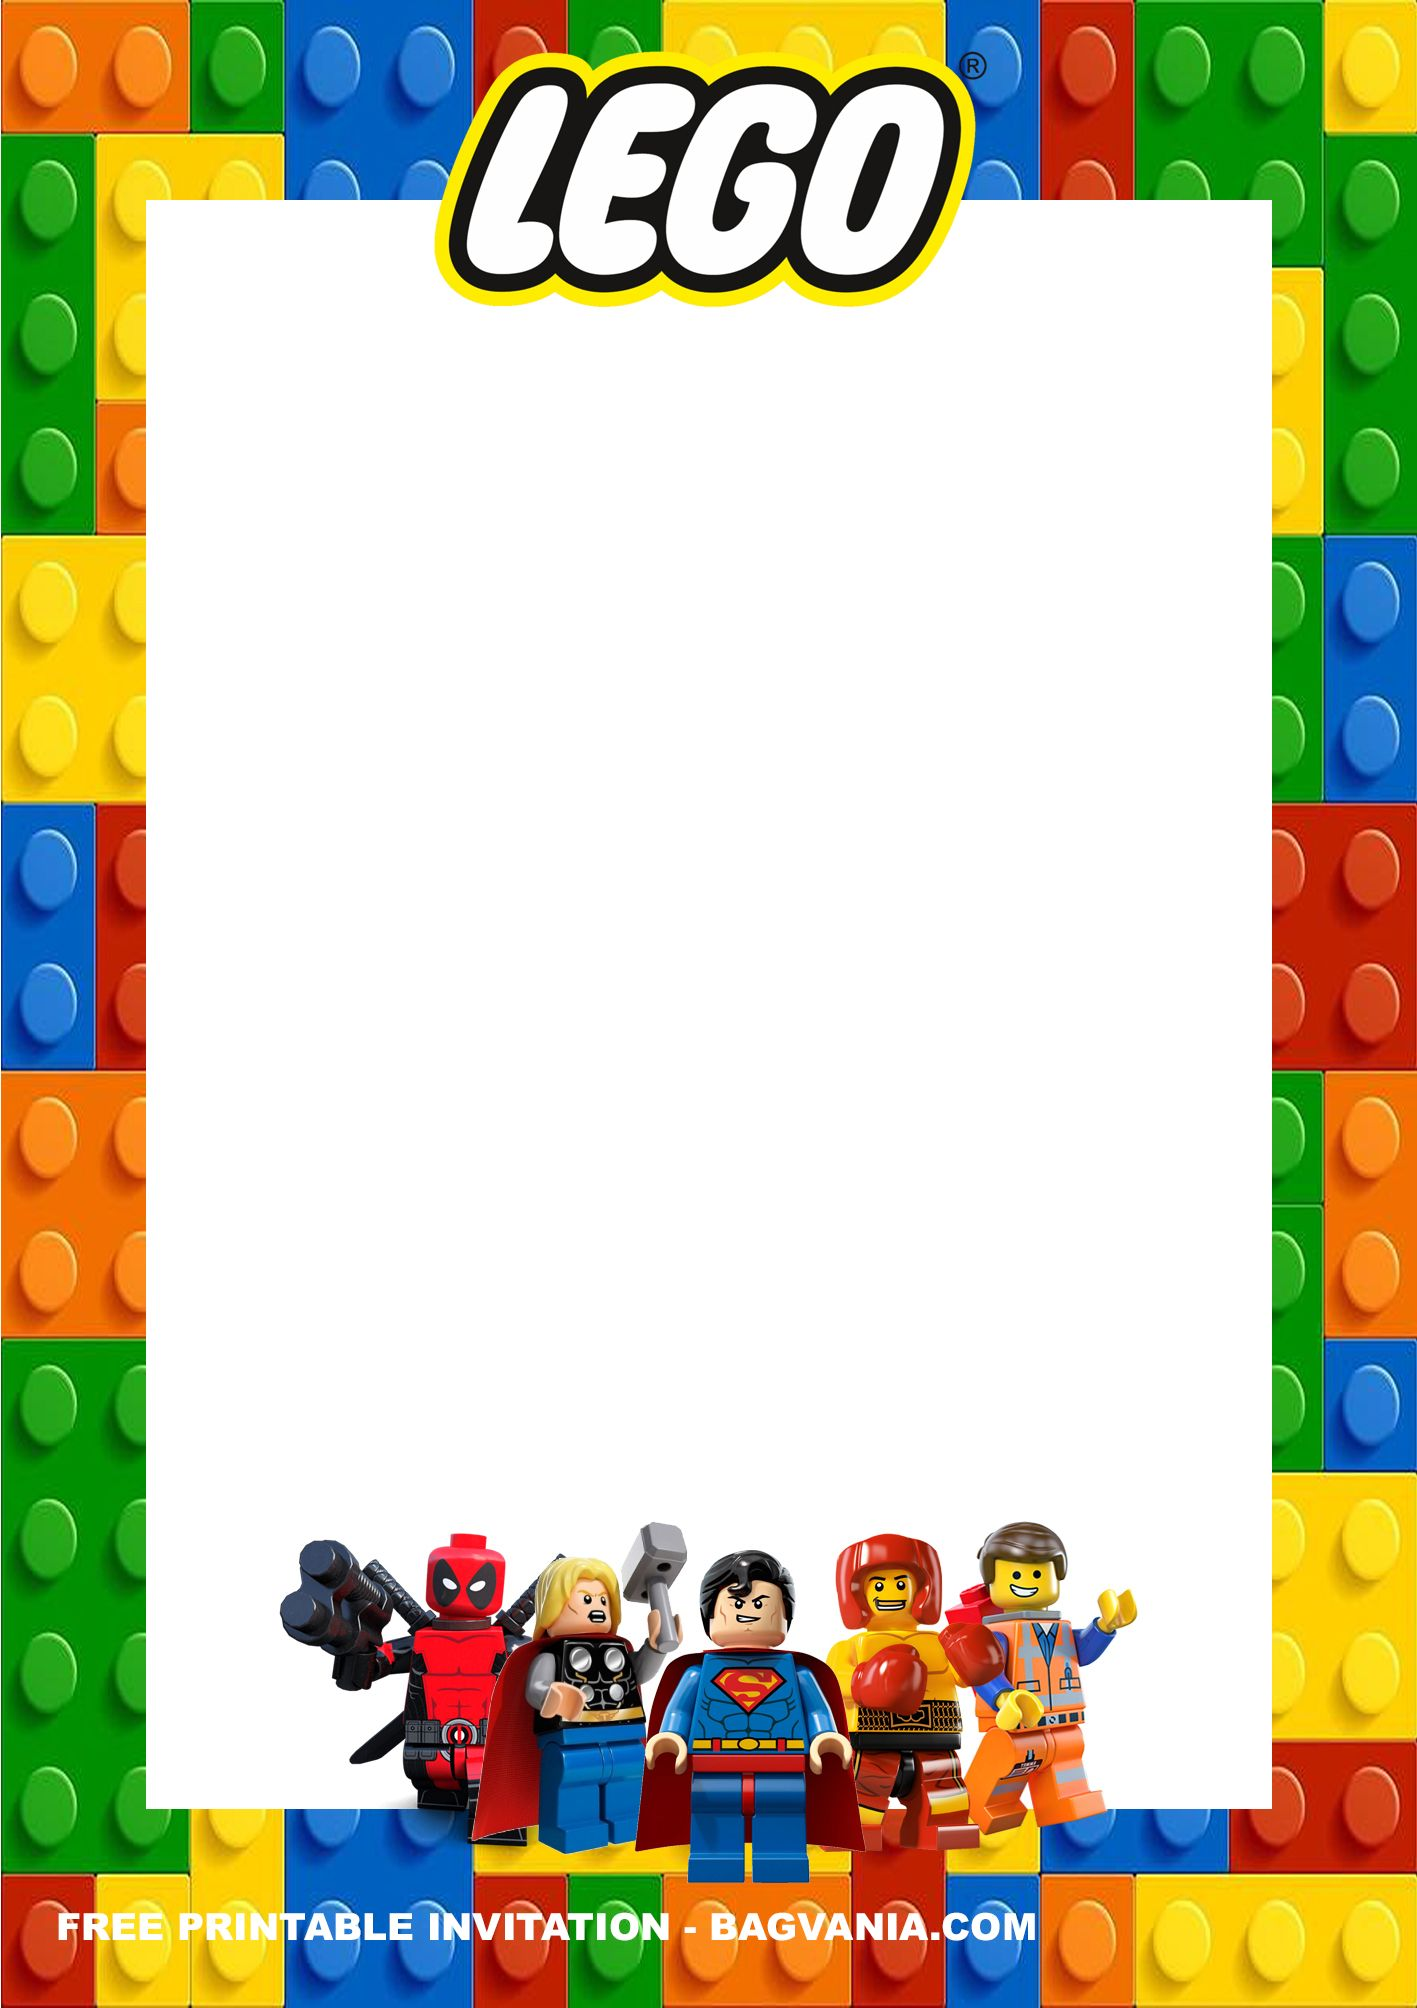 Free Printable Lego Superheroes Birthday Invitation Templates Superhero Birthday Invitations Lego Birthday Invitation Lego Party Invitations Free